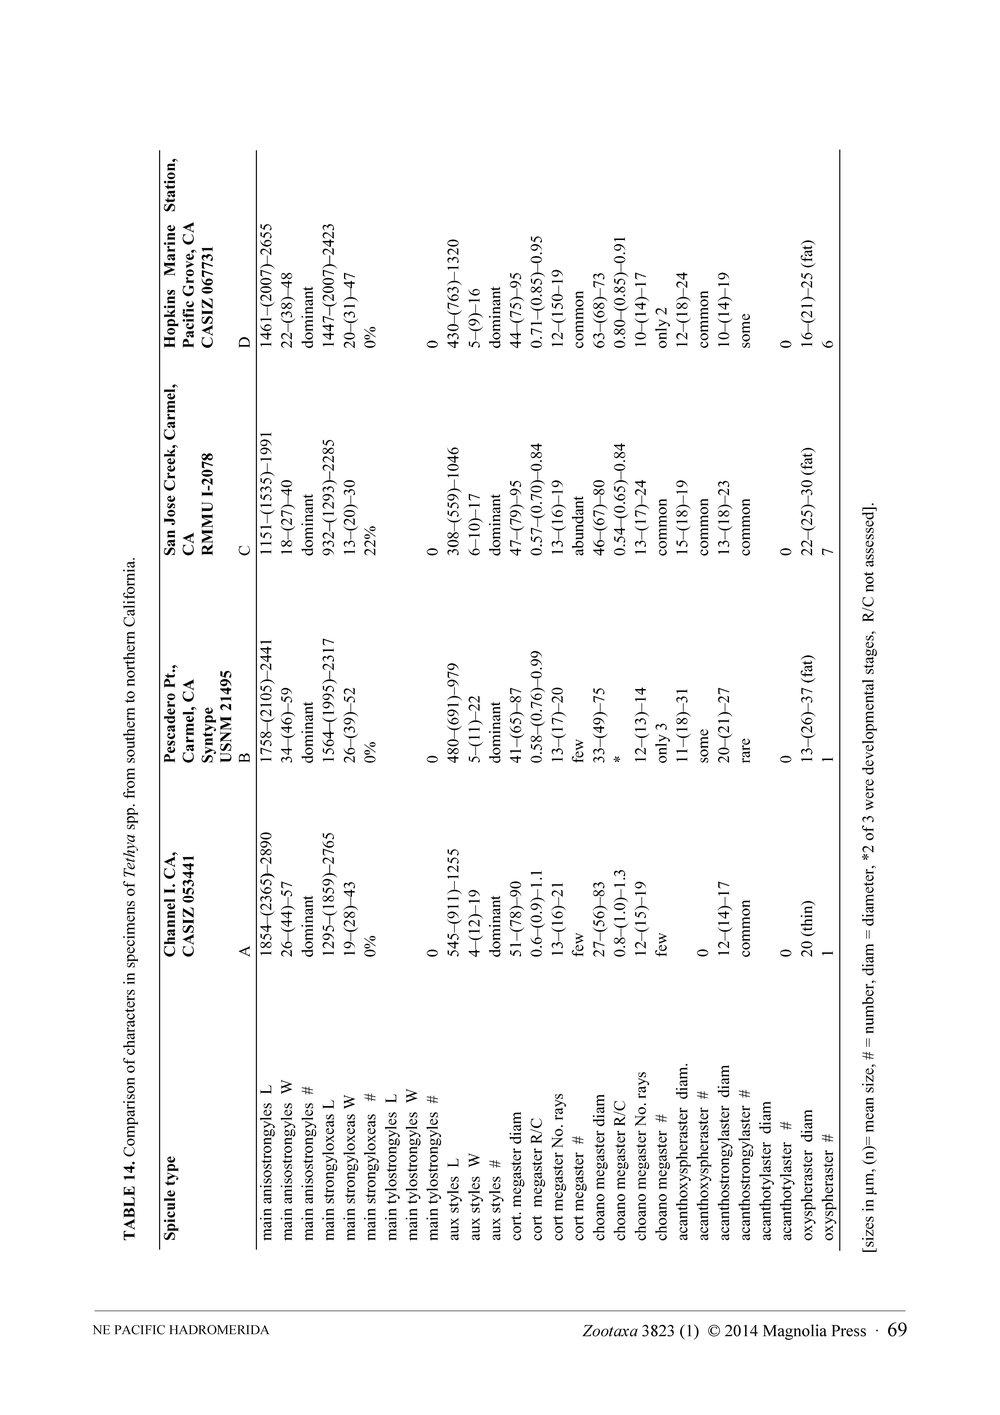 Austin et al 2014 NE Pacific Hadromerids_Page_69.jpg